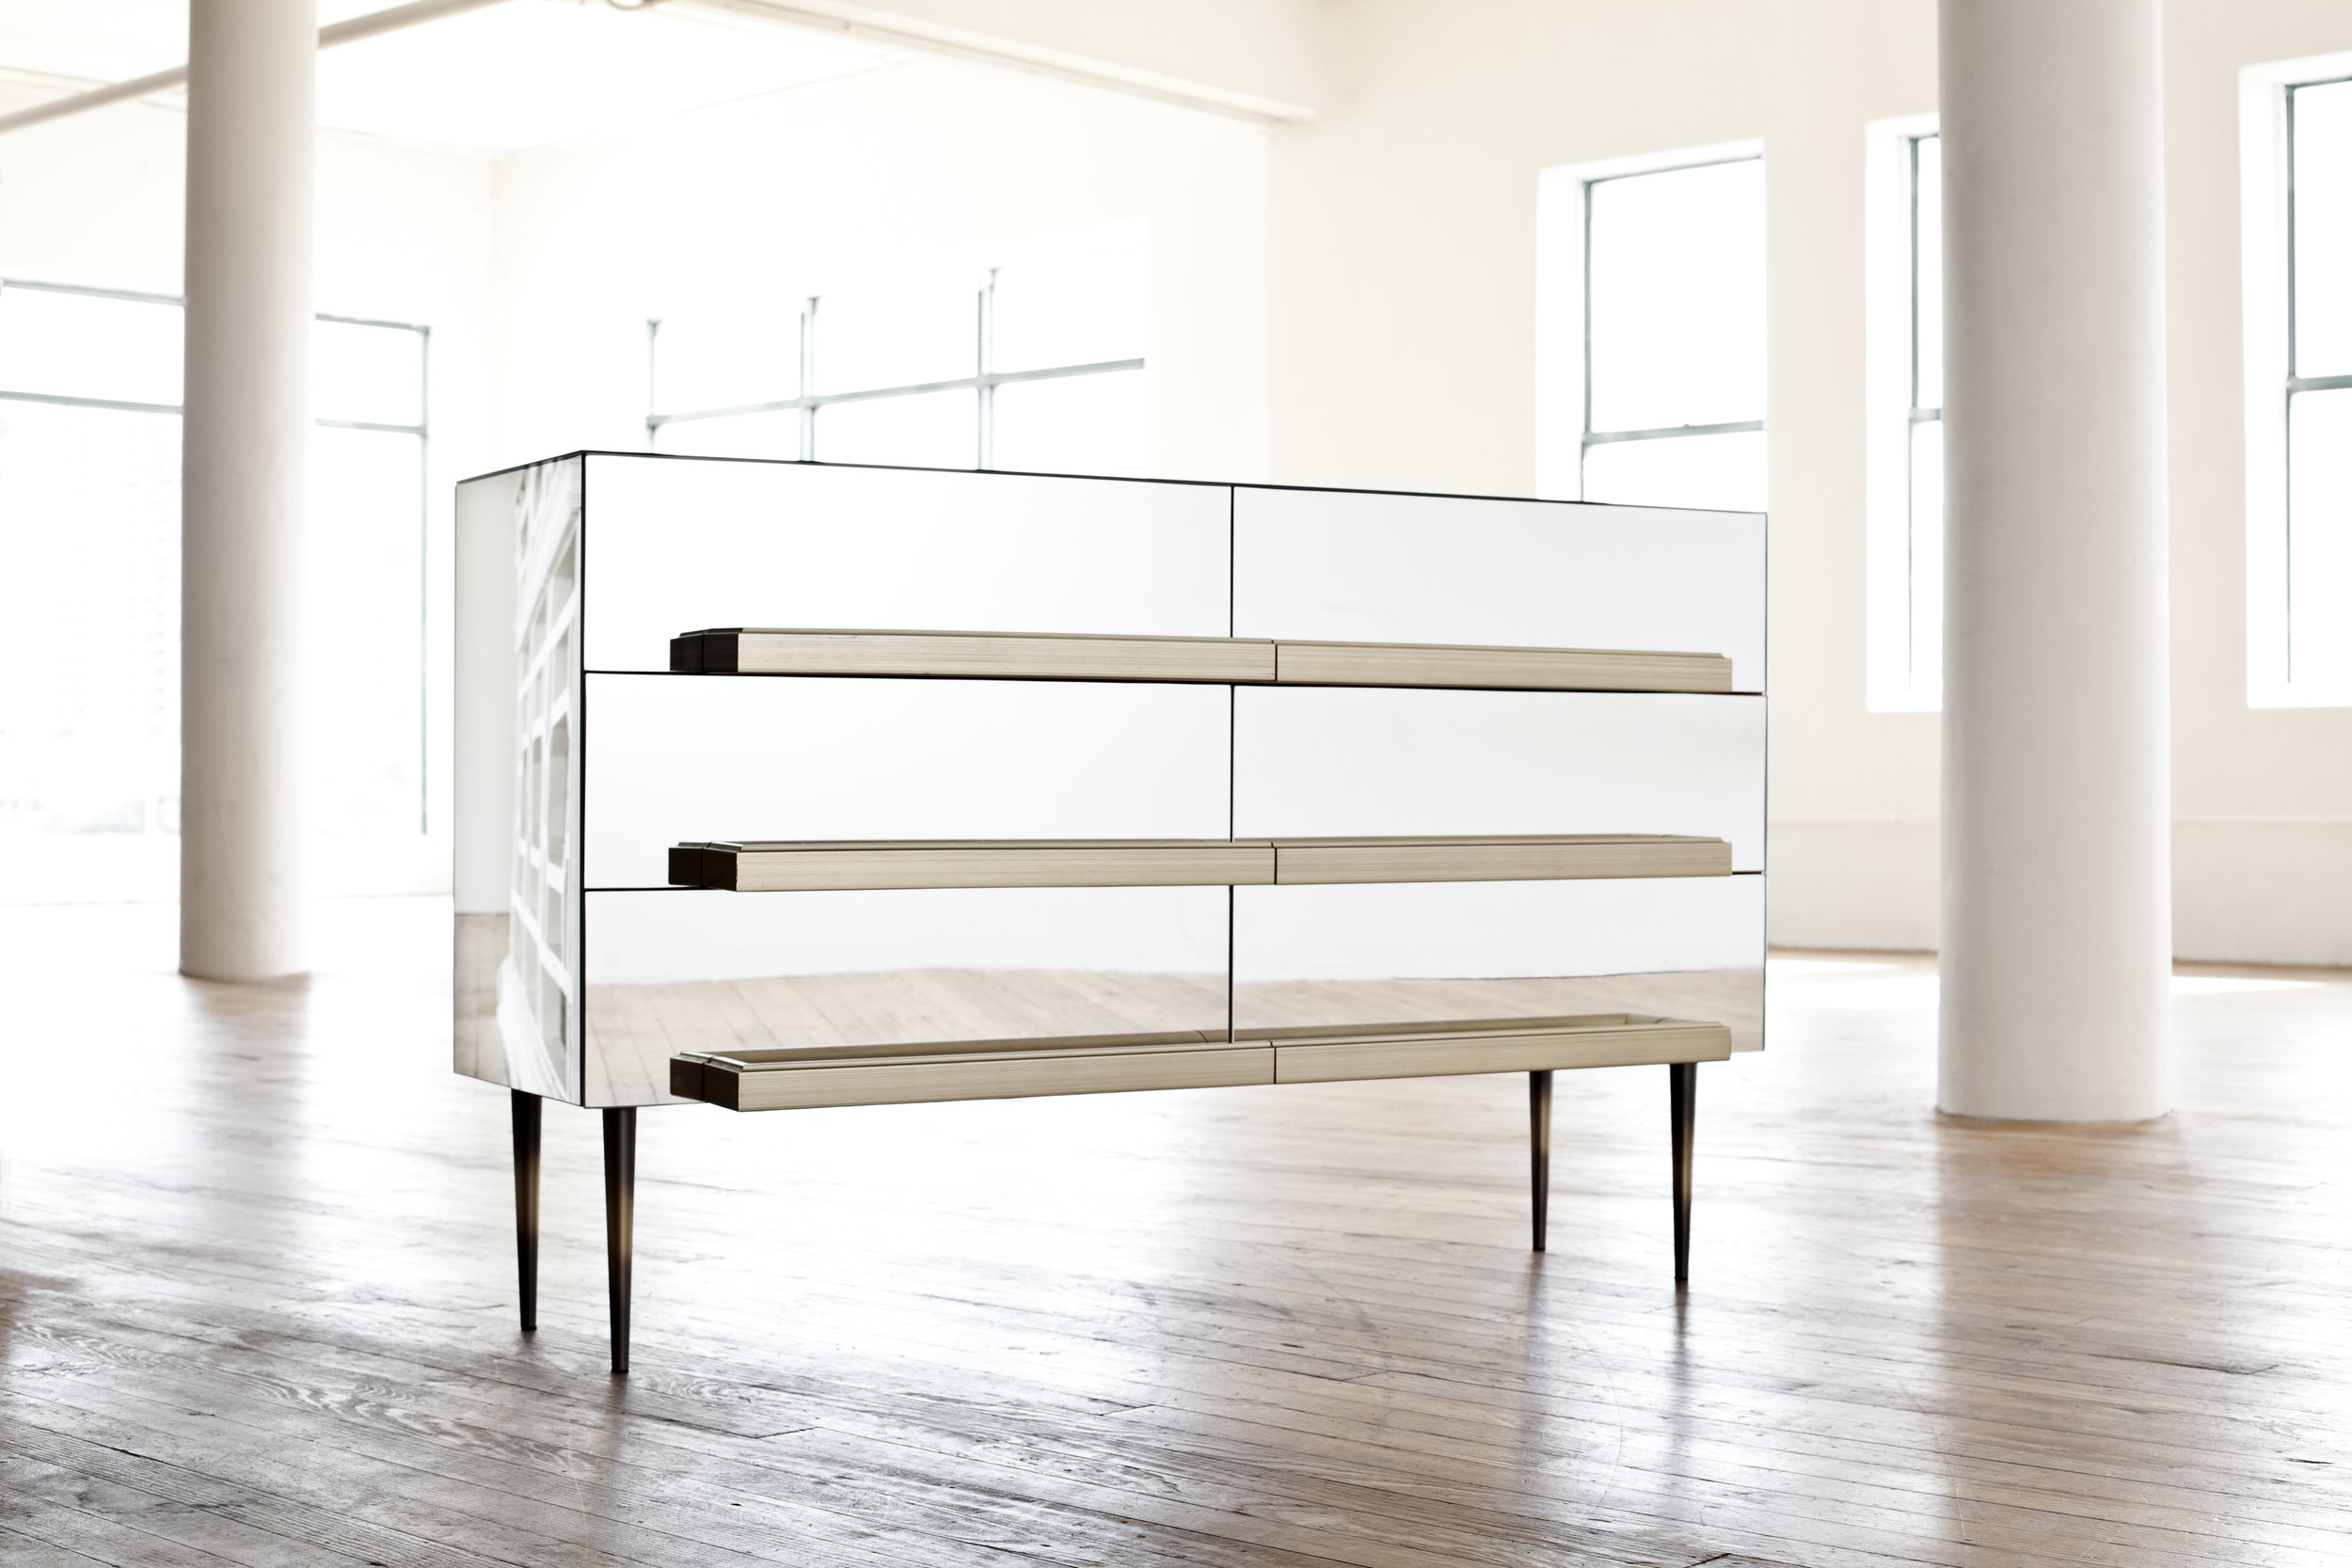 luis-pons-design-furniture-collection-mirror_6.jpg